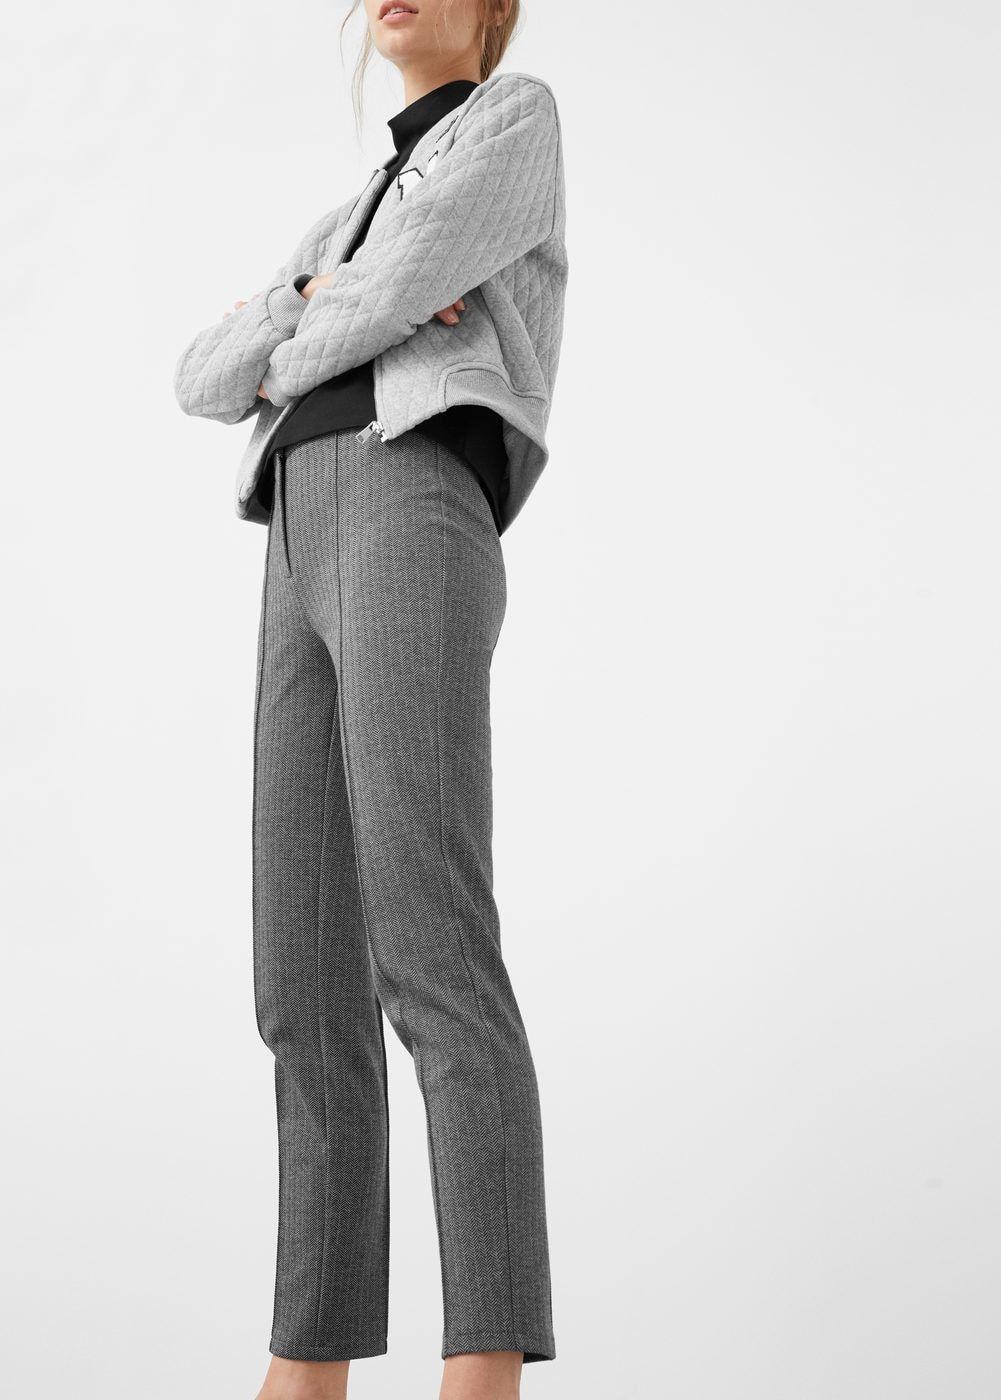 Slim Fit Cotton Blend Pants Women Trousers Women Pants For Women Pants